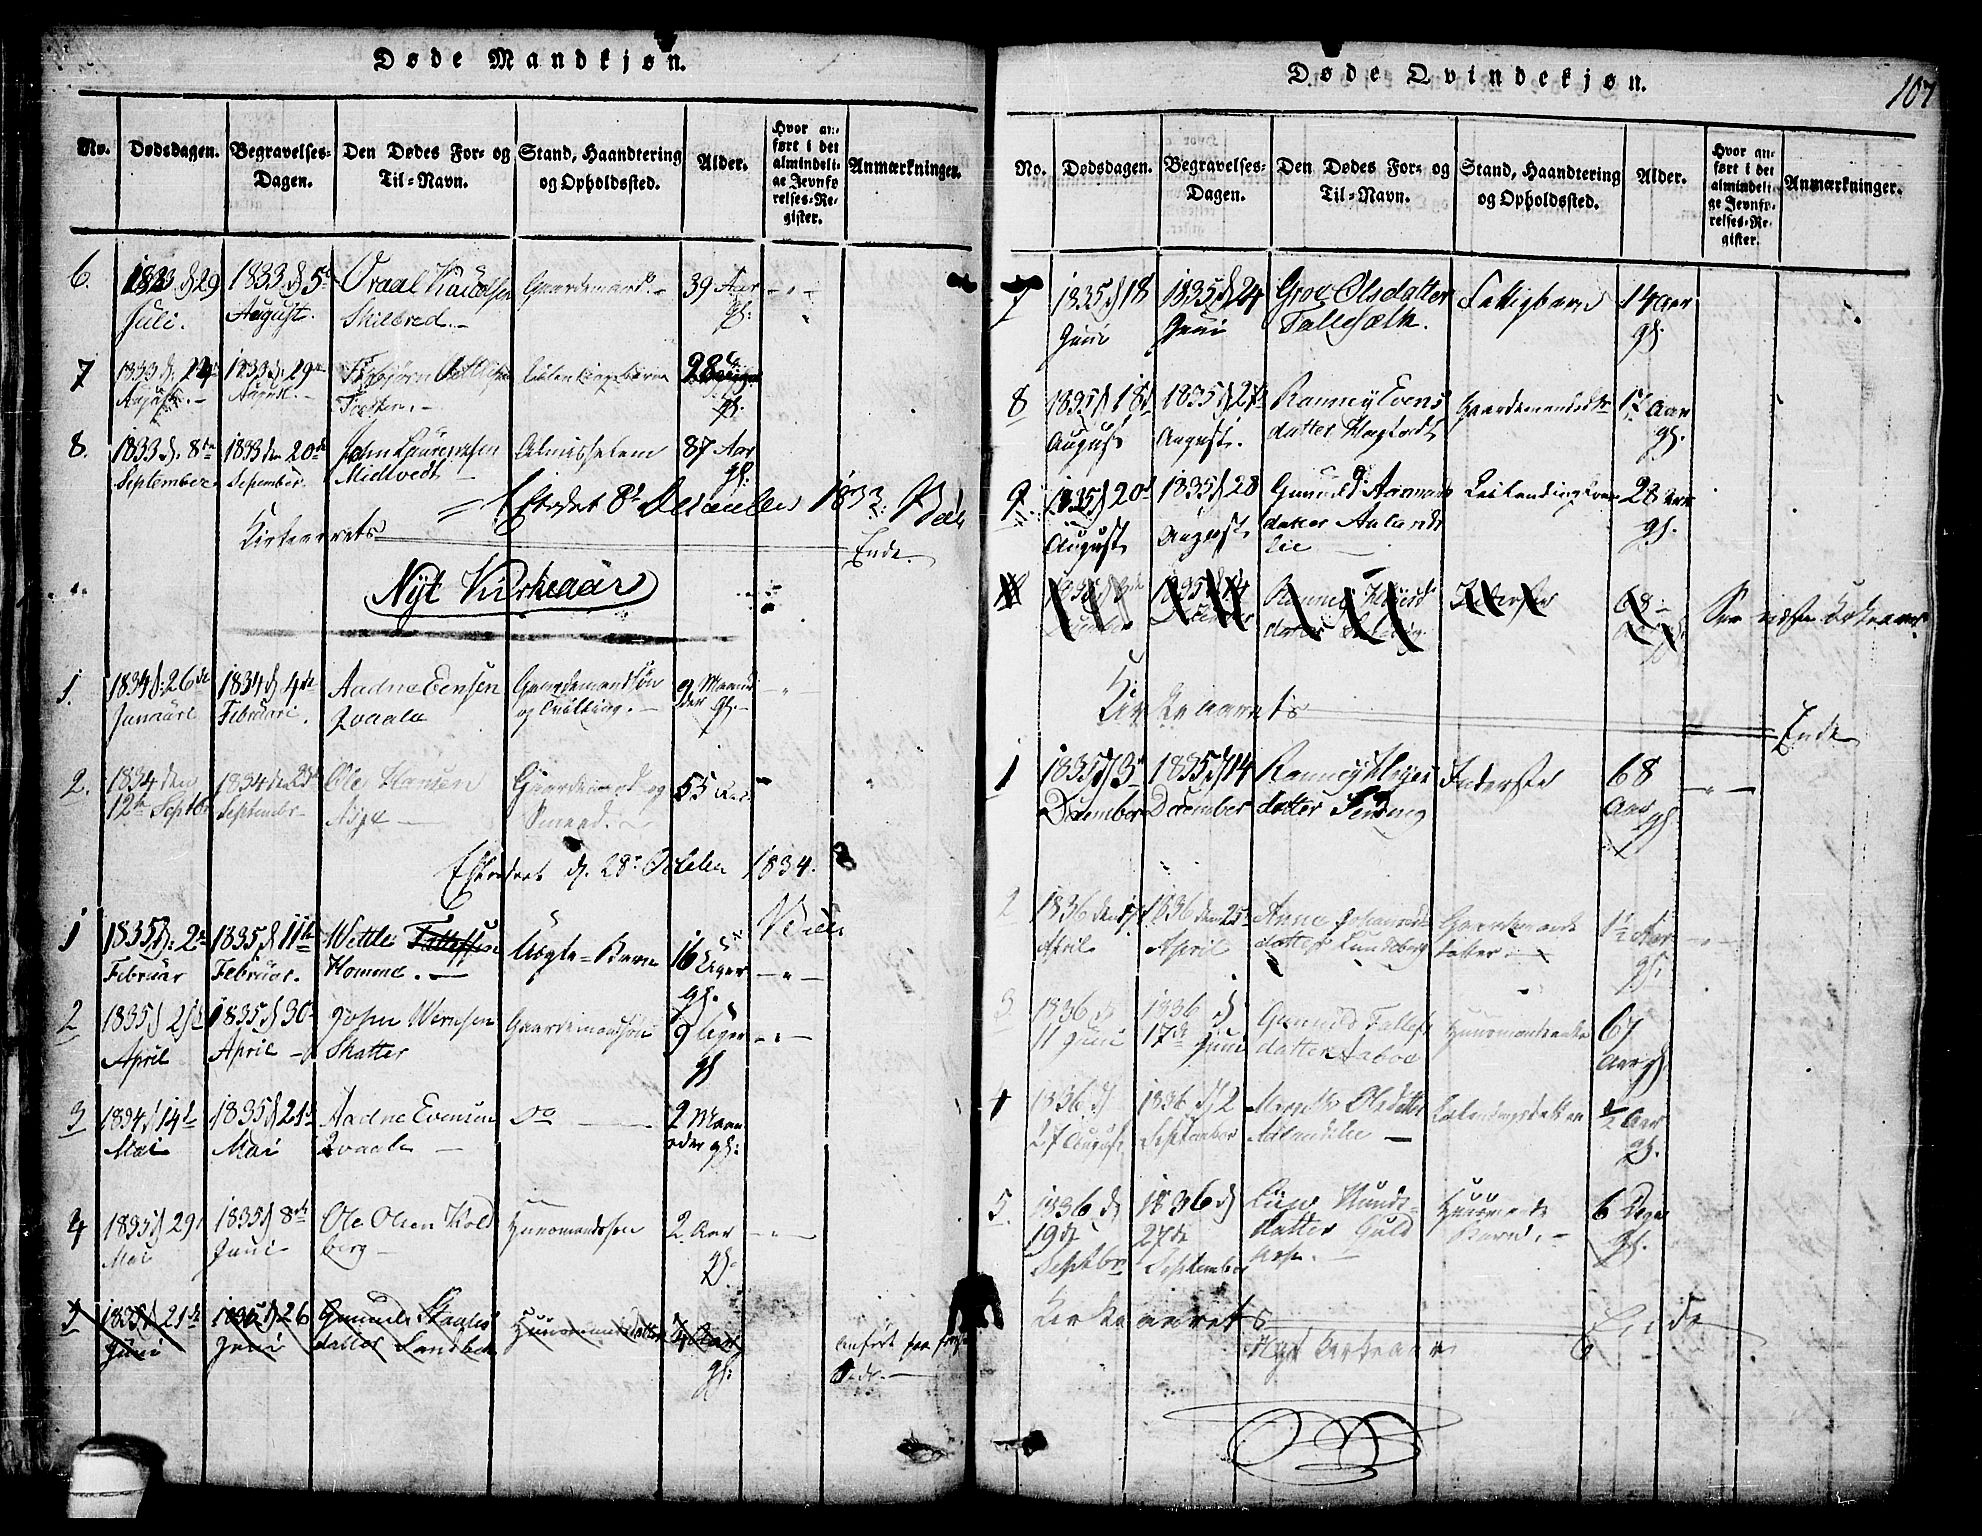 SAKO, Lårdal kirkebøker, G/Ga/L0001: Klokkerbok nr. I 1, 1815-1861, s. 107